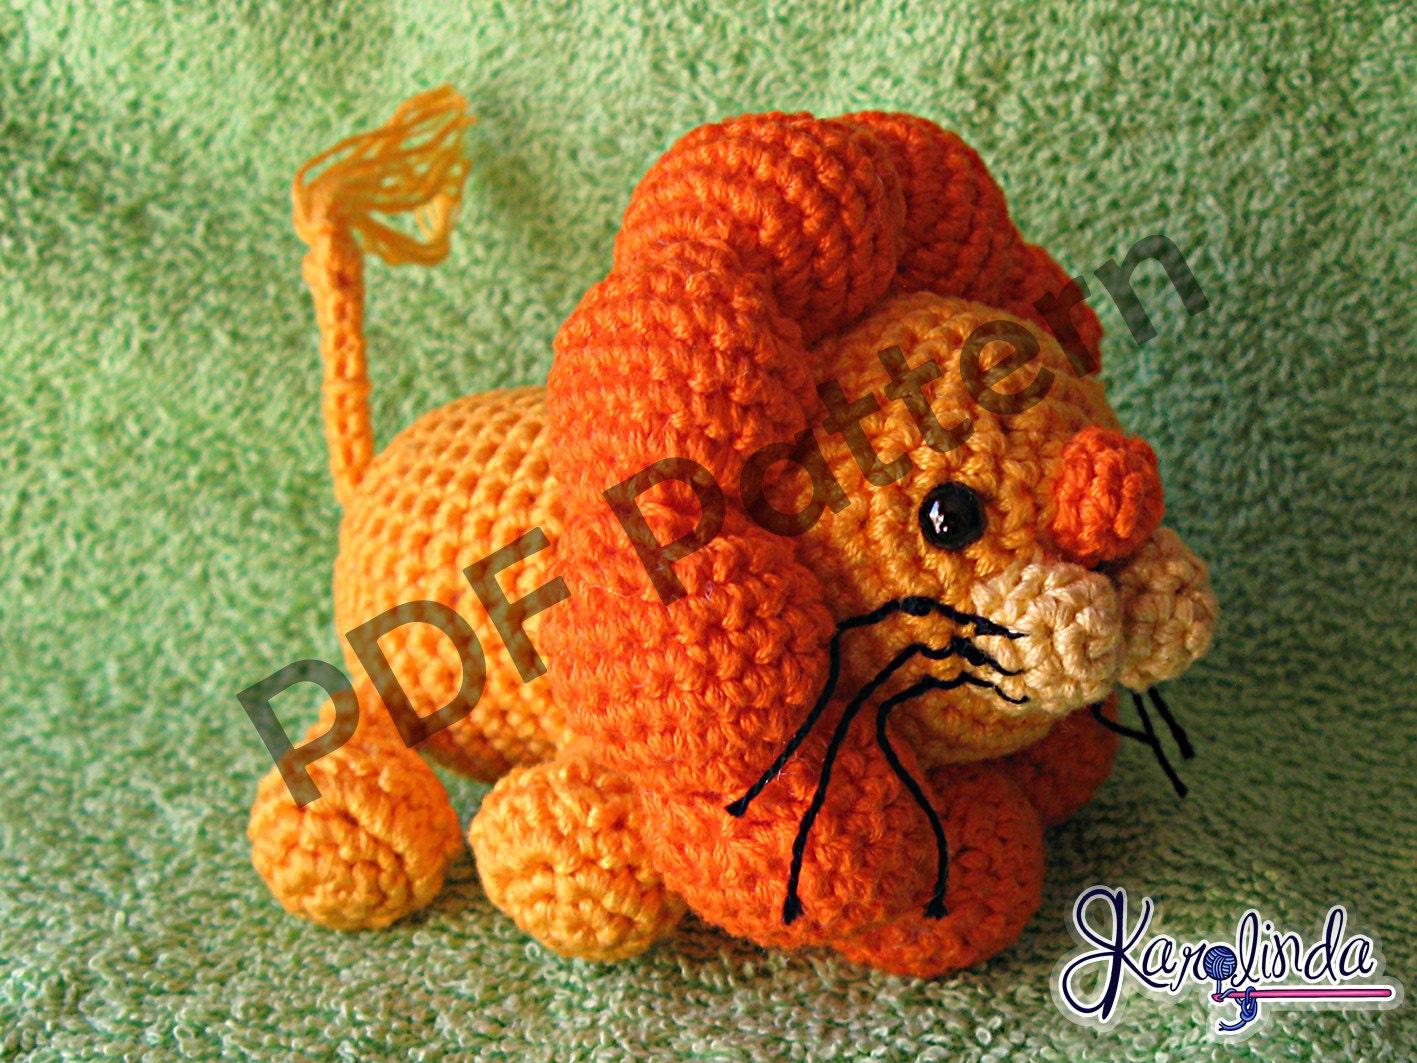 Amigurumi Patterns Lion : Amigurumi Lion PDF Crochet Pattern by karolinda on Etsy